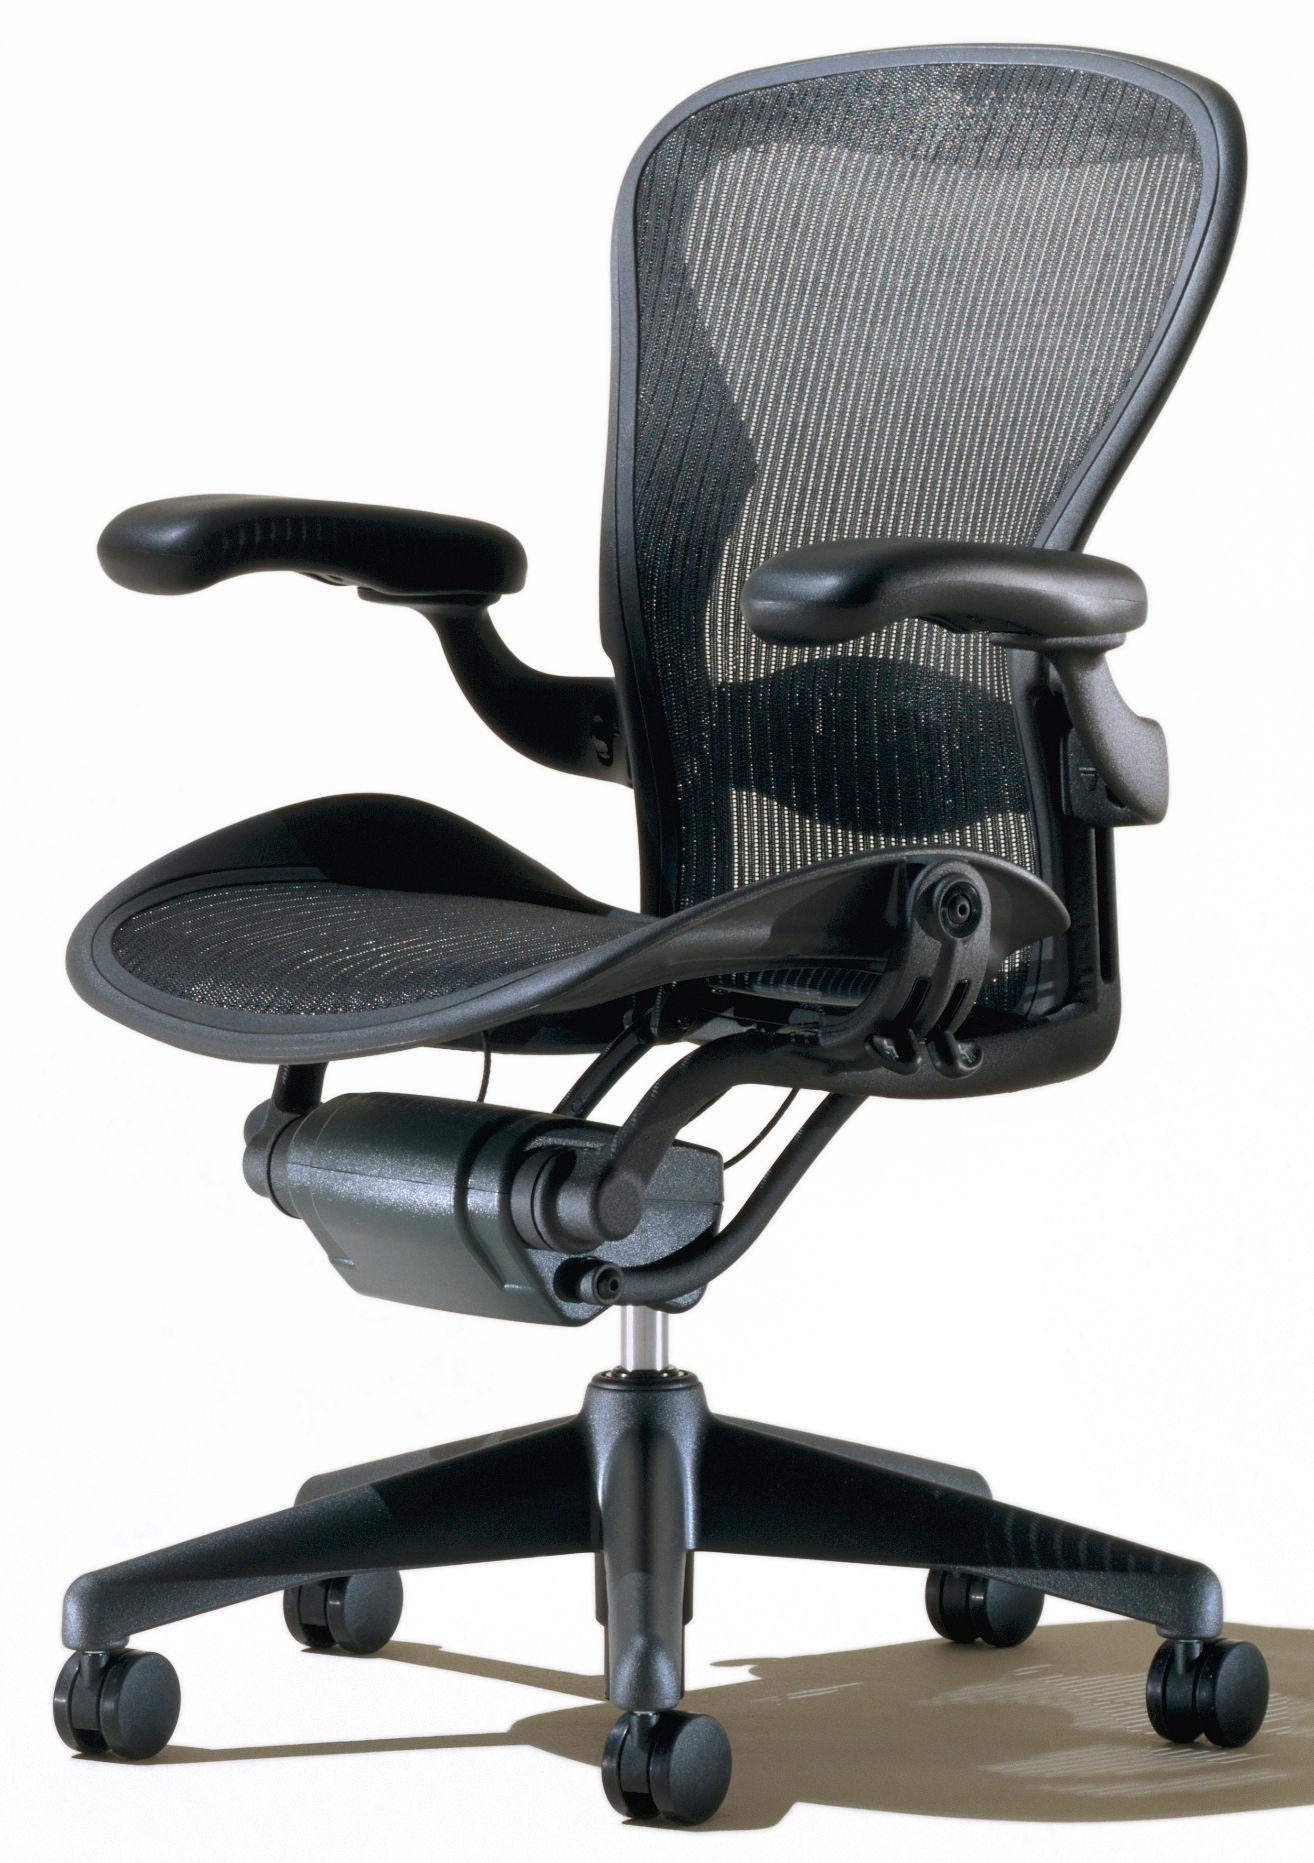 fauteuil roulettes aeron assise souple graphite noir herman miller made in design. Black Bedroom Furniture Sets. Home Design Ideas